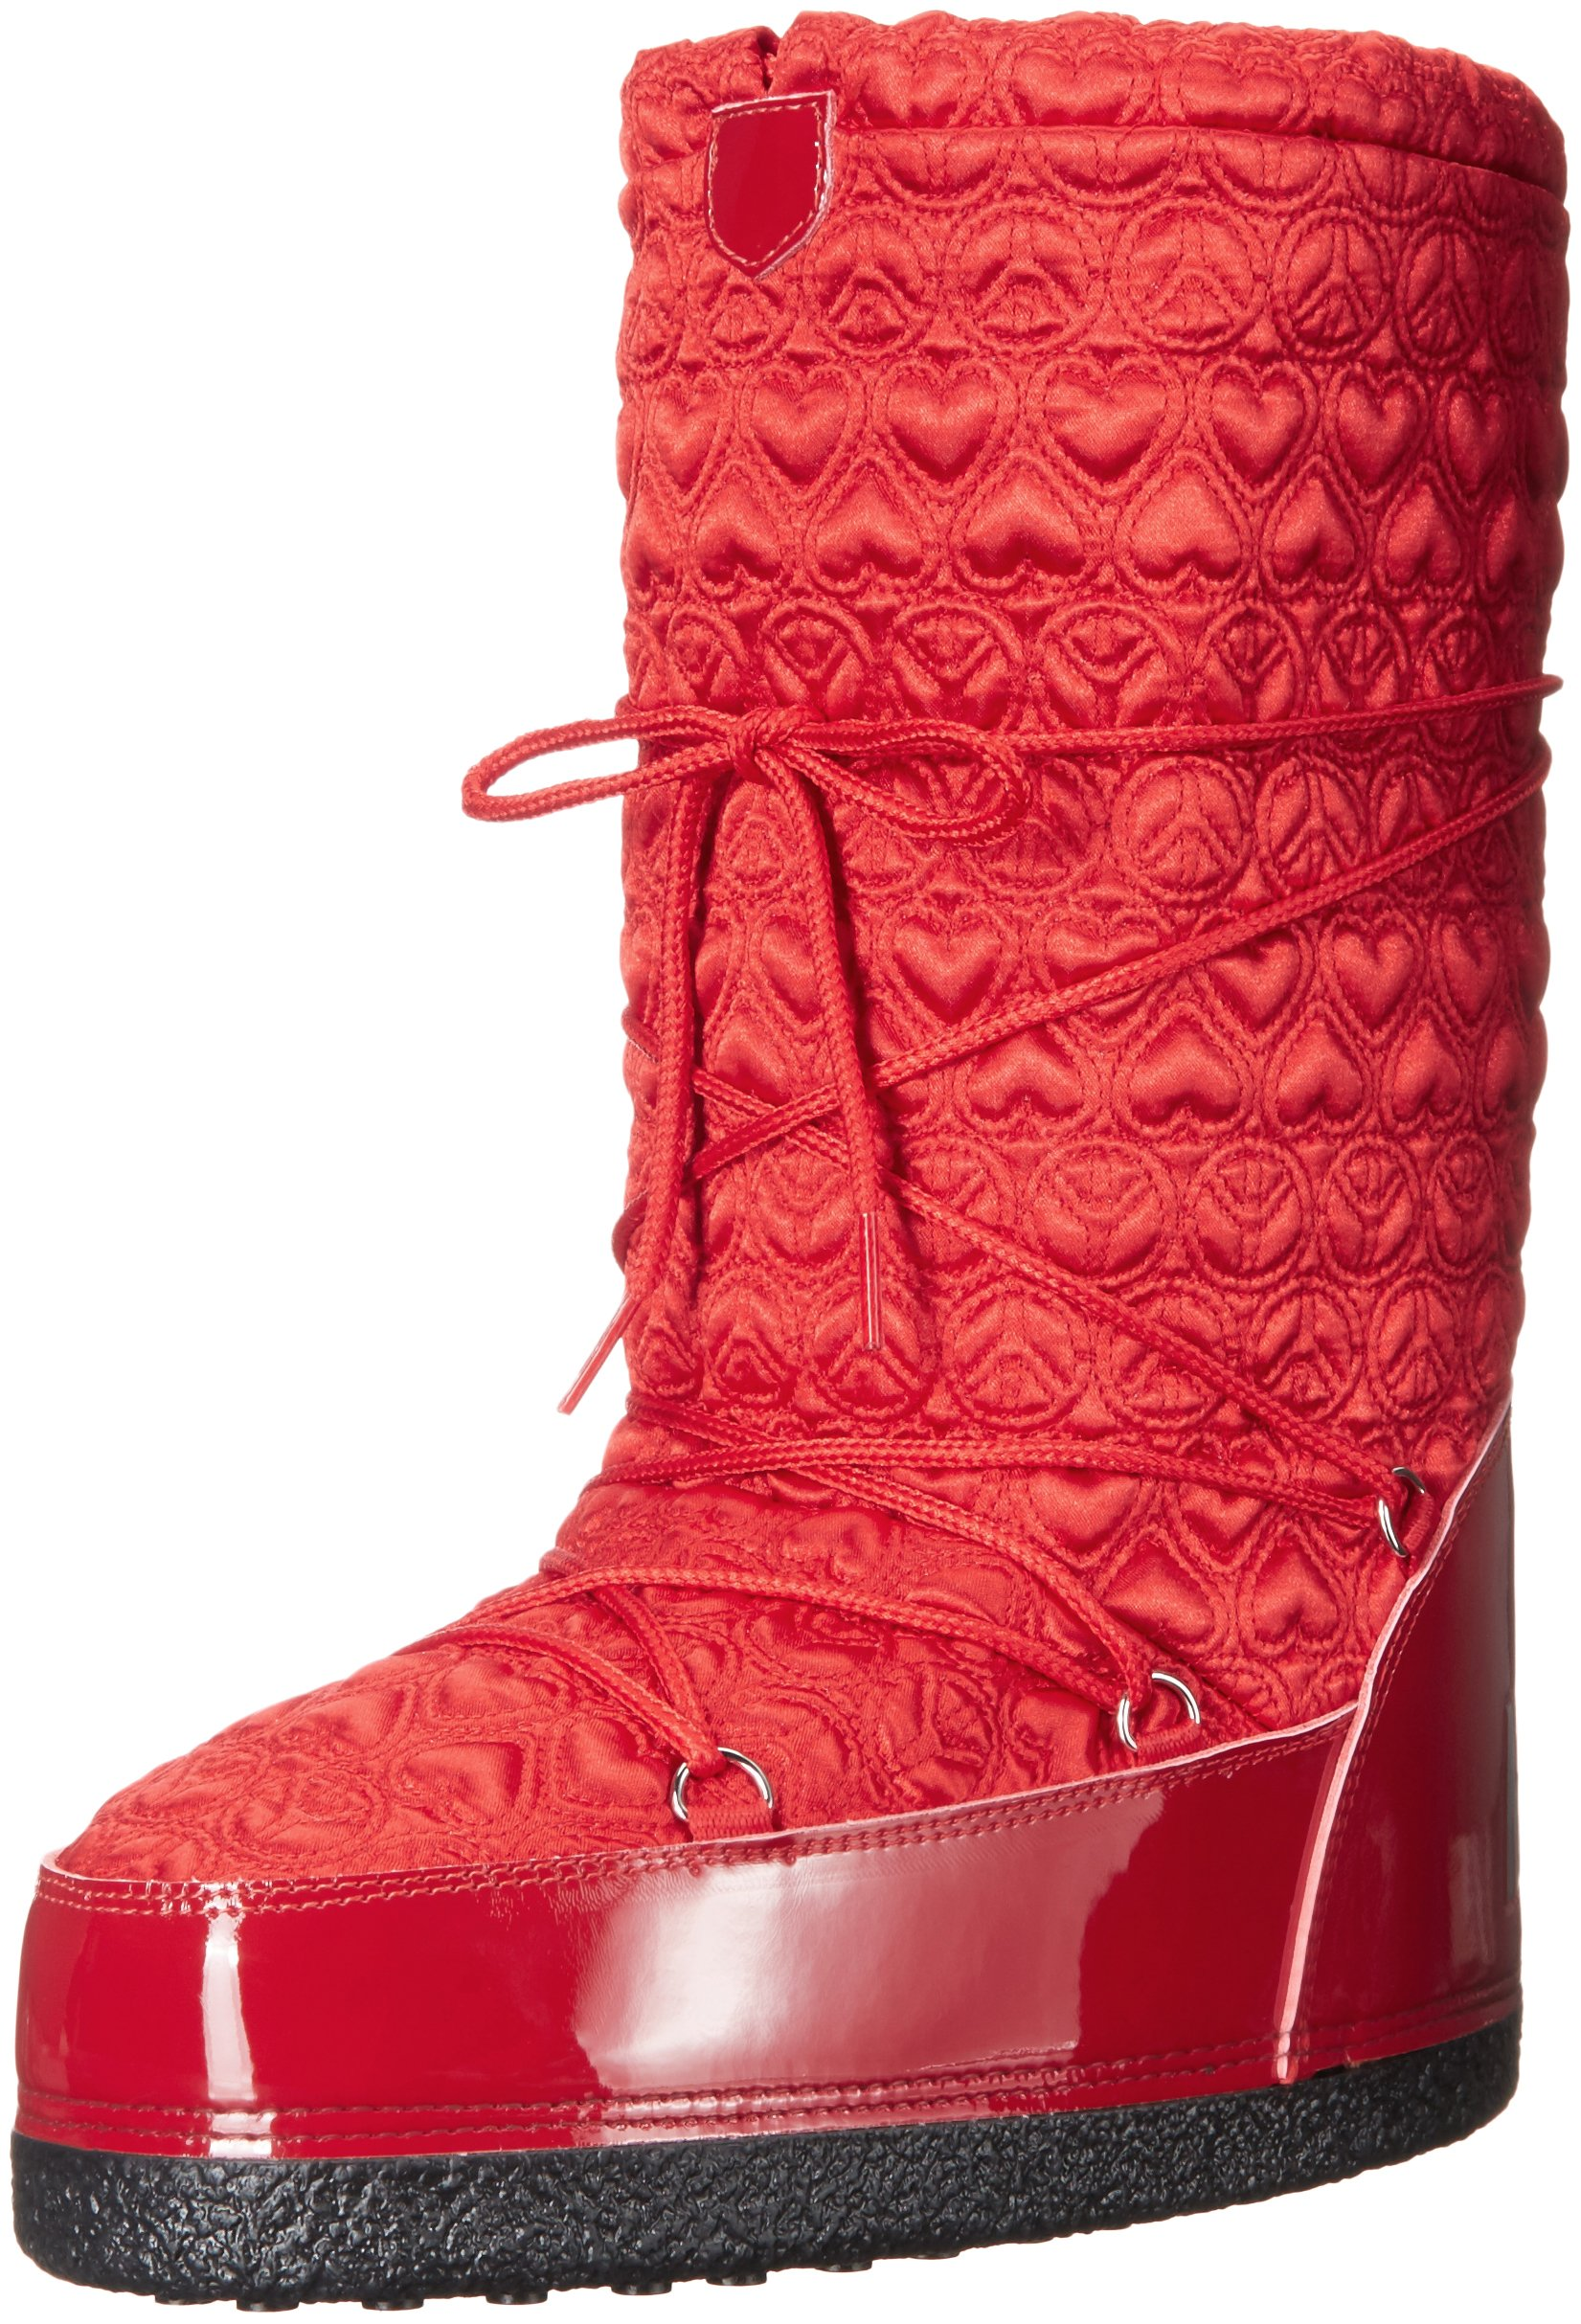 Love Moschino Women's Peace Moonboot Snow Boot, Red, 41 EU/11 M US